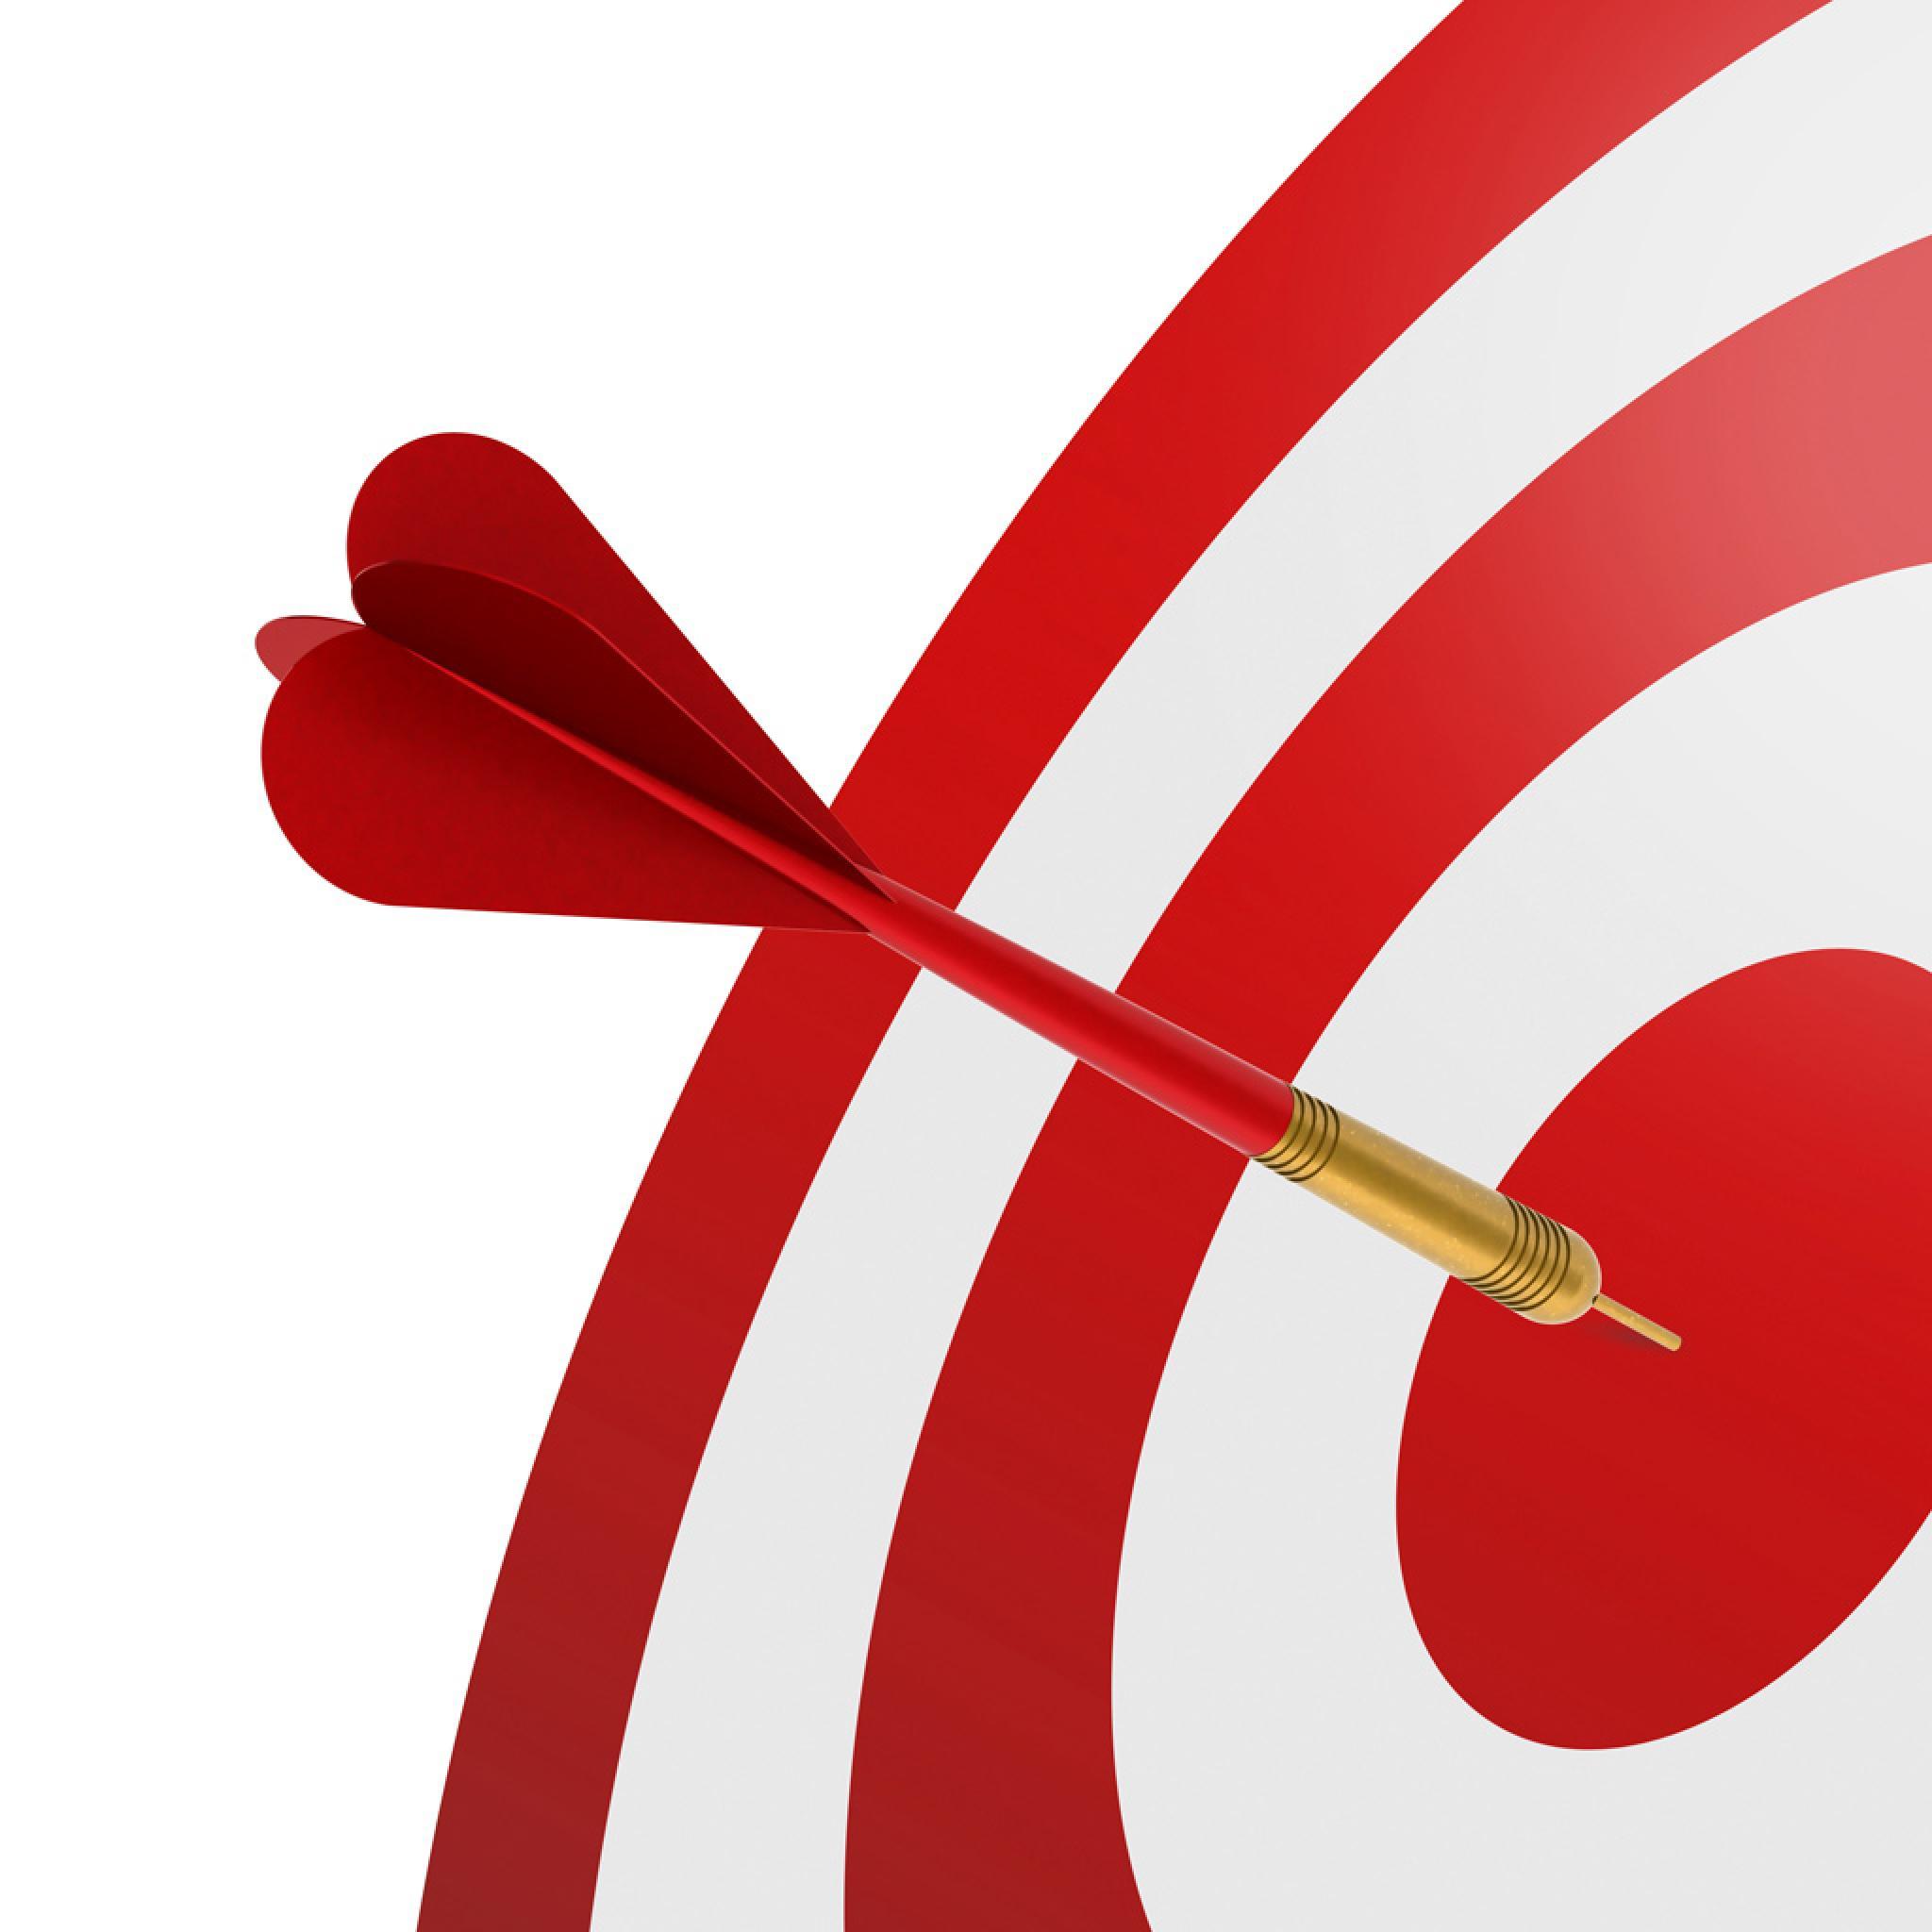 Vector - Darts Hit The Bullseye - iPad iPhone HD Wallpaper Free